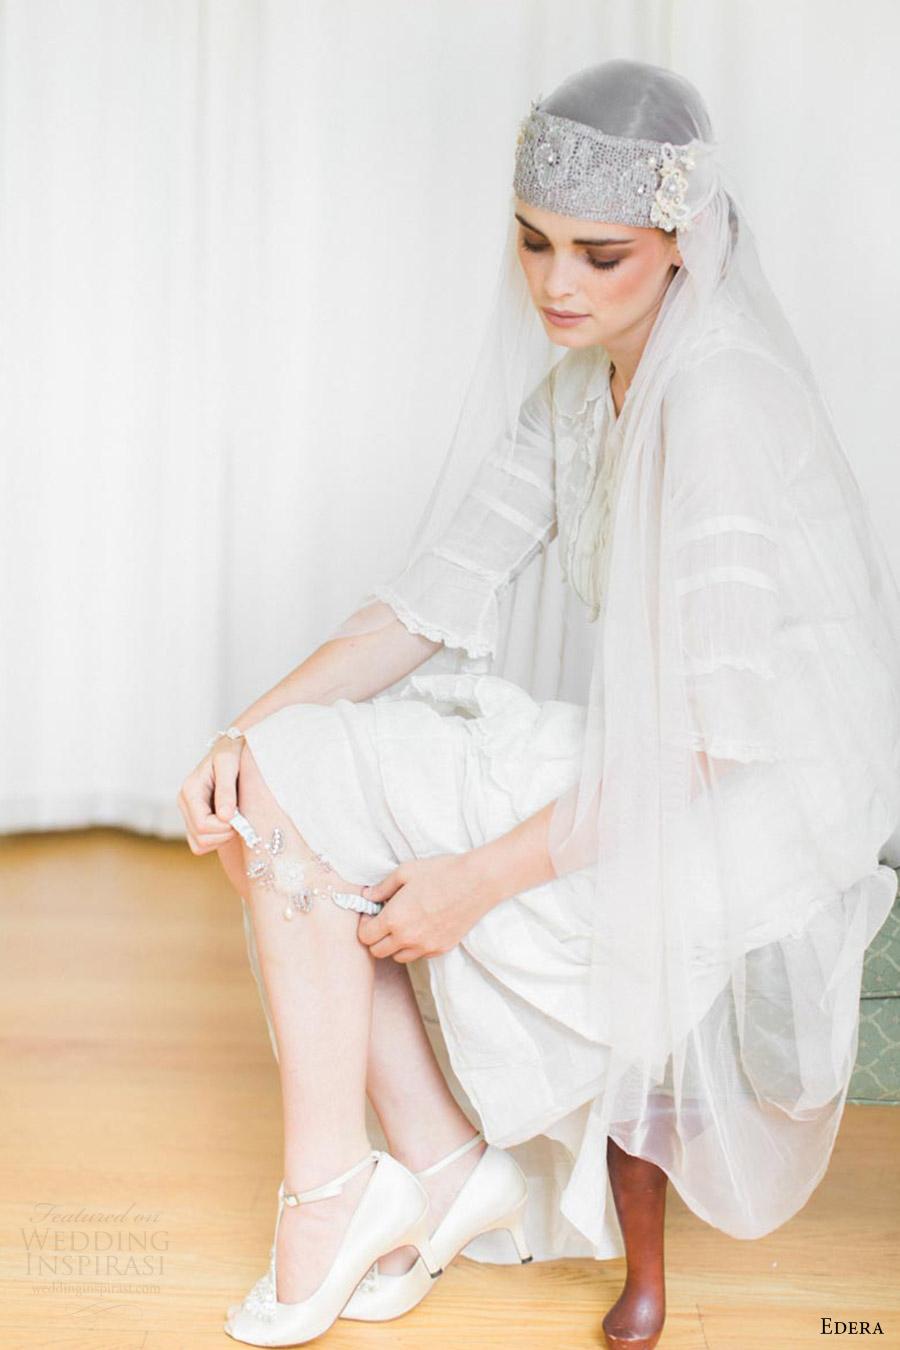 edera jewelry 2016 bridal accessories collection aquarelle (coralie) wedding garter